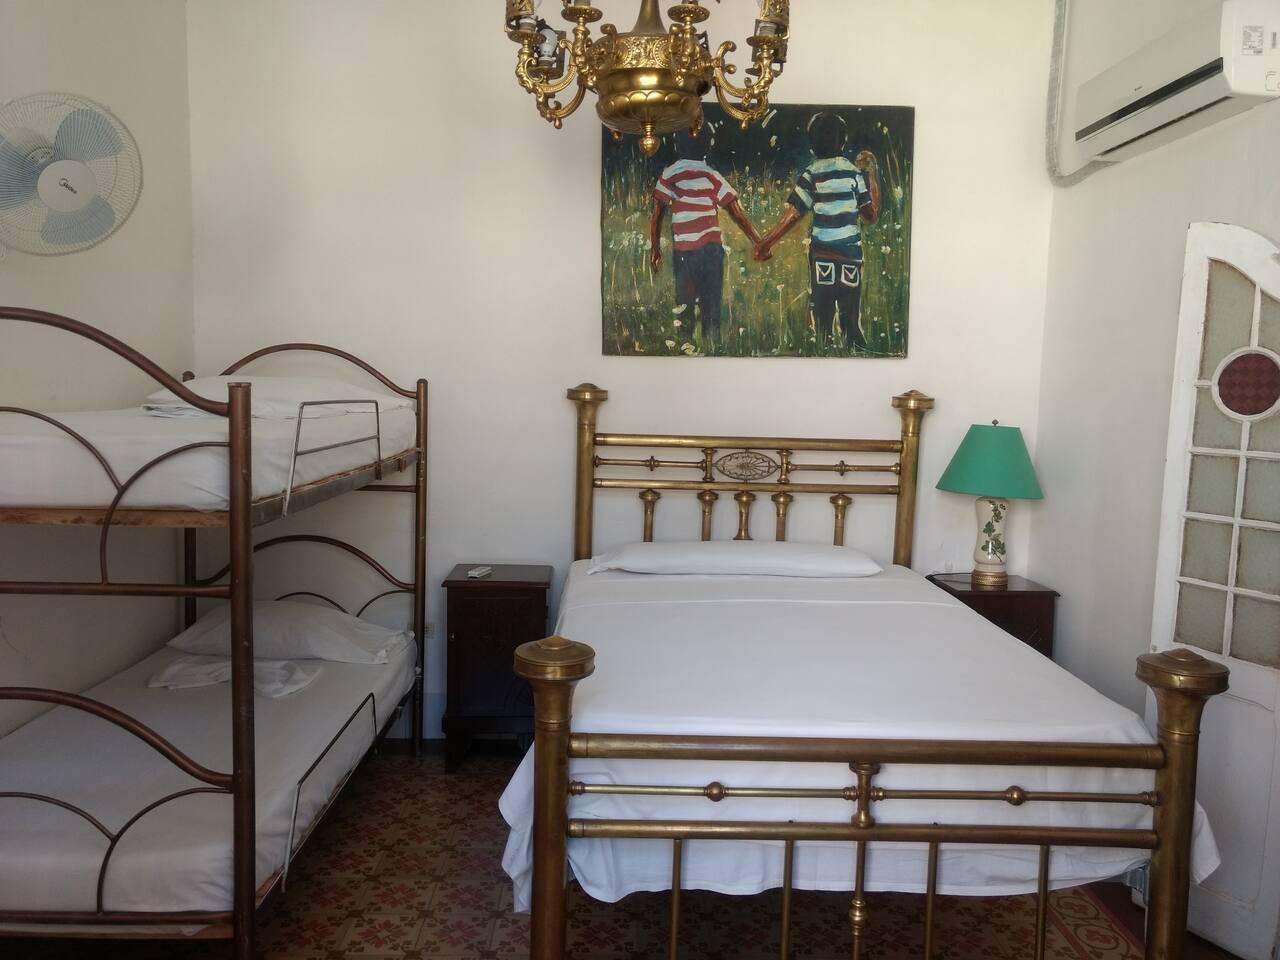 CIE002 – Room 3 Quadruple room with private bathroom